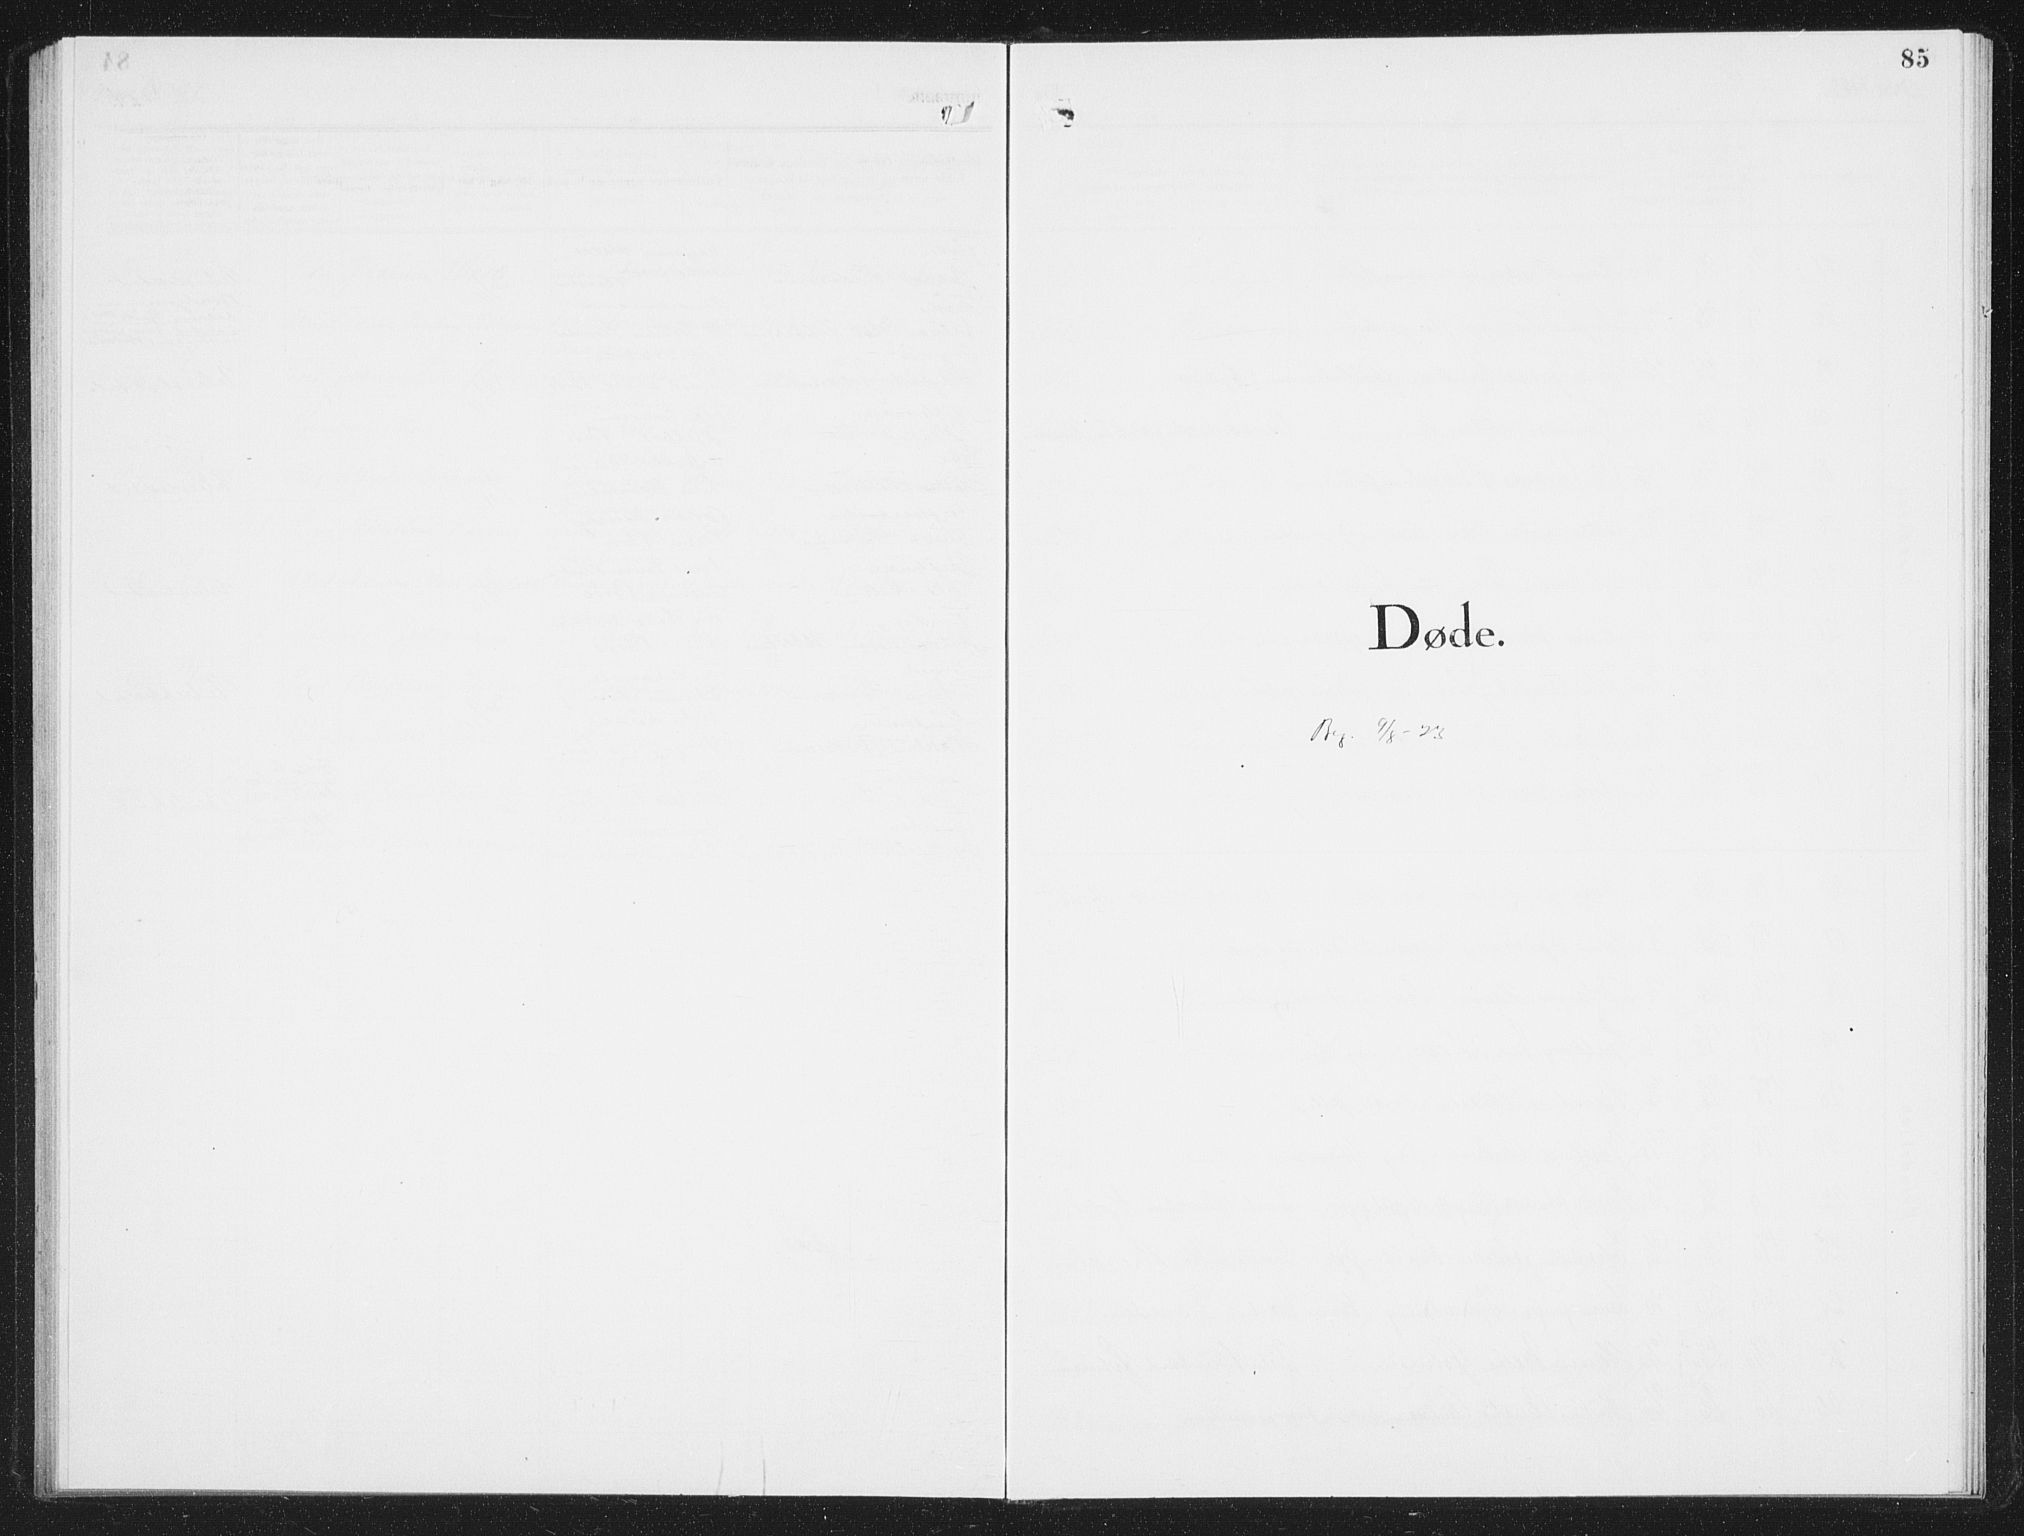 SAT, Ministerialprotokoller, klokkerbøker og fødselsregistre - Nordland, 801/L0036: Klokkerbok nr. 801C11, 1920-1934, s. 85